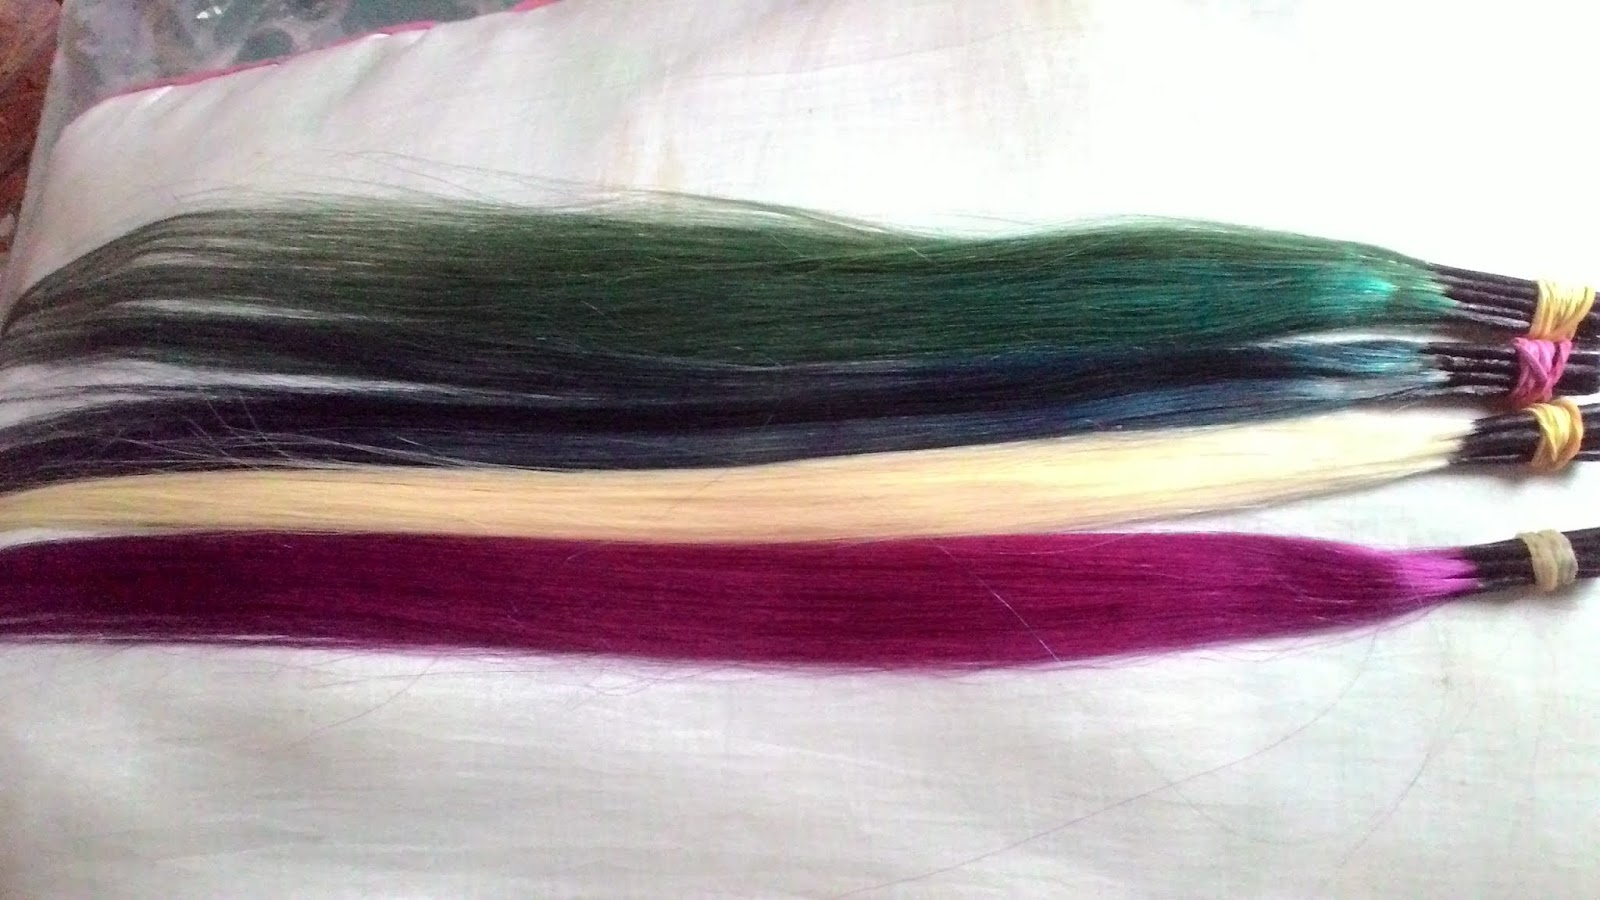 Daftar Harga Hair Extension 2019 Daniico Salon Daniico Salon Suplier Rambut Sambungan Indonesia